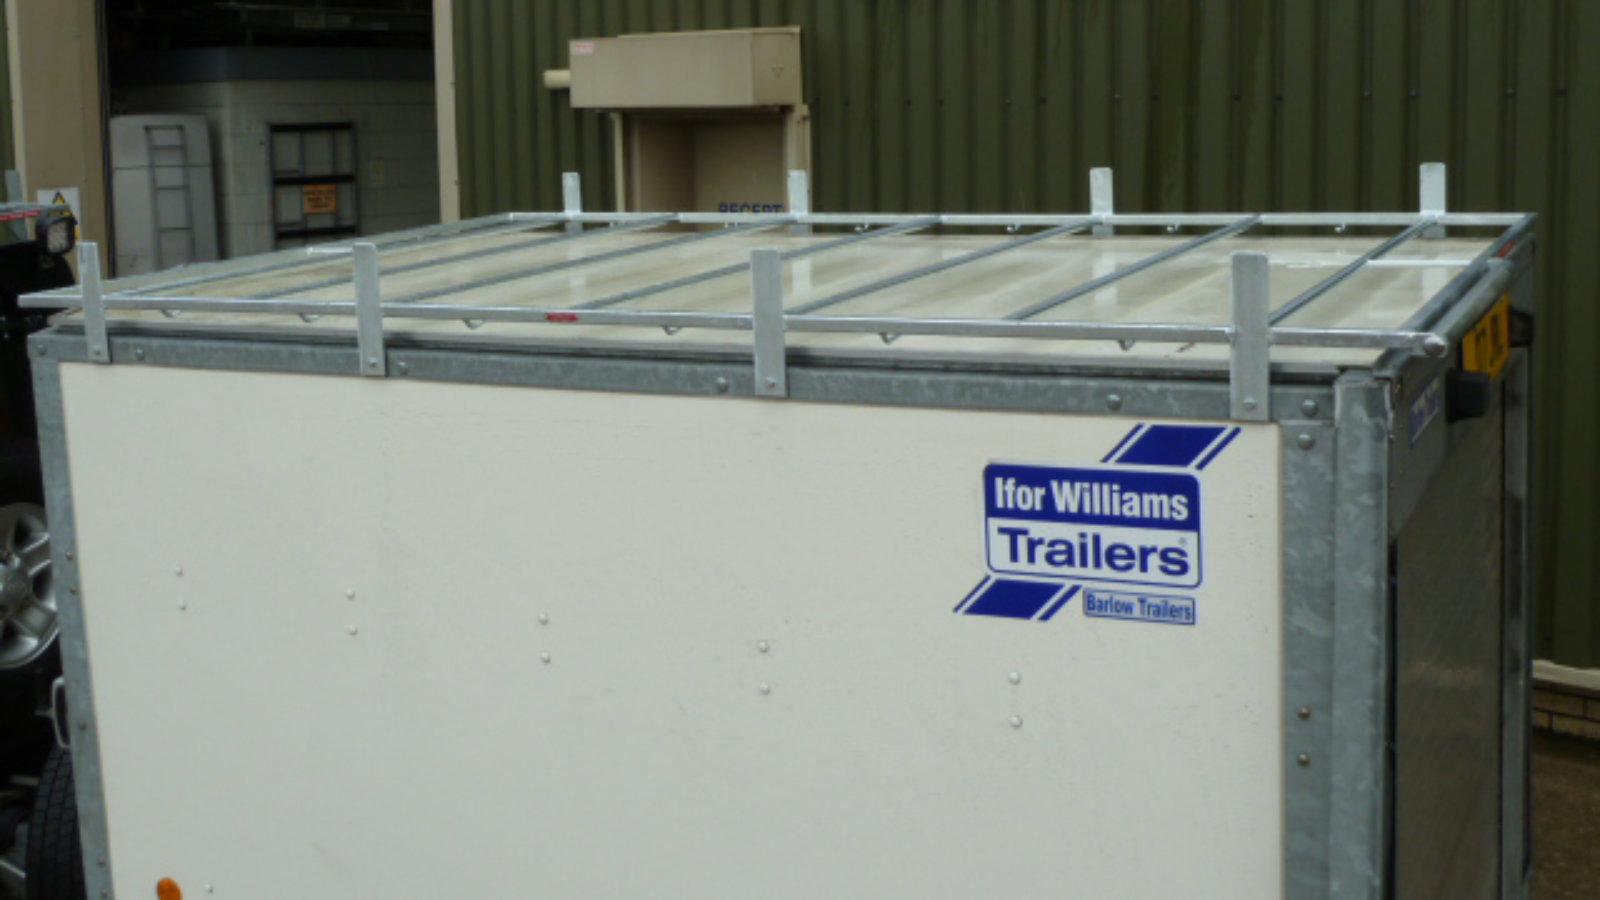 Sdv Roof Racks Bespoke Roof Racks North West Uk